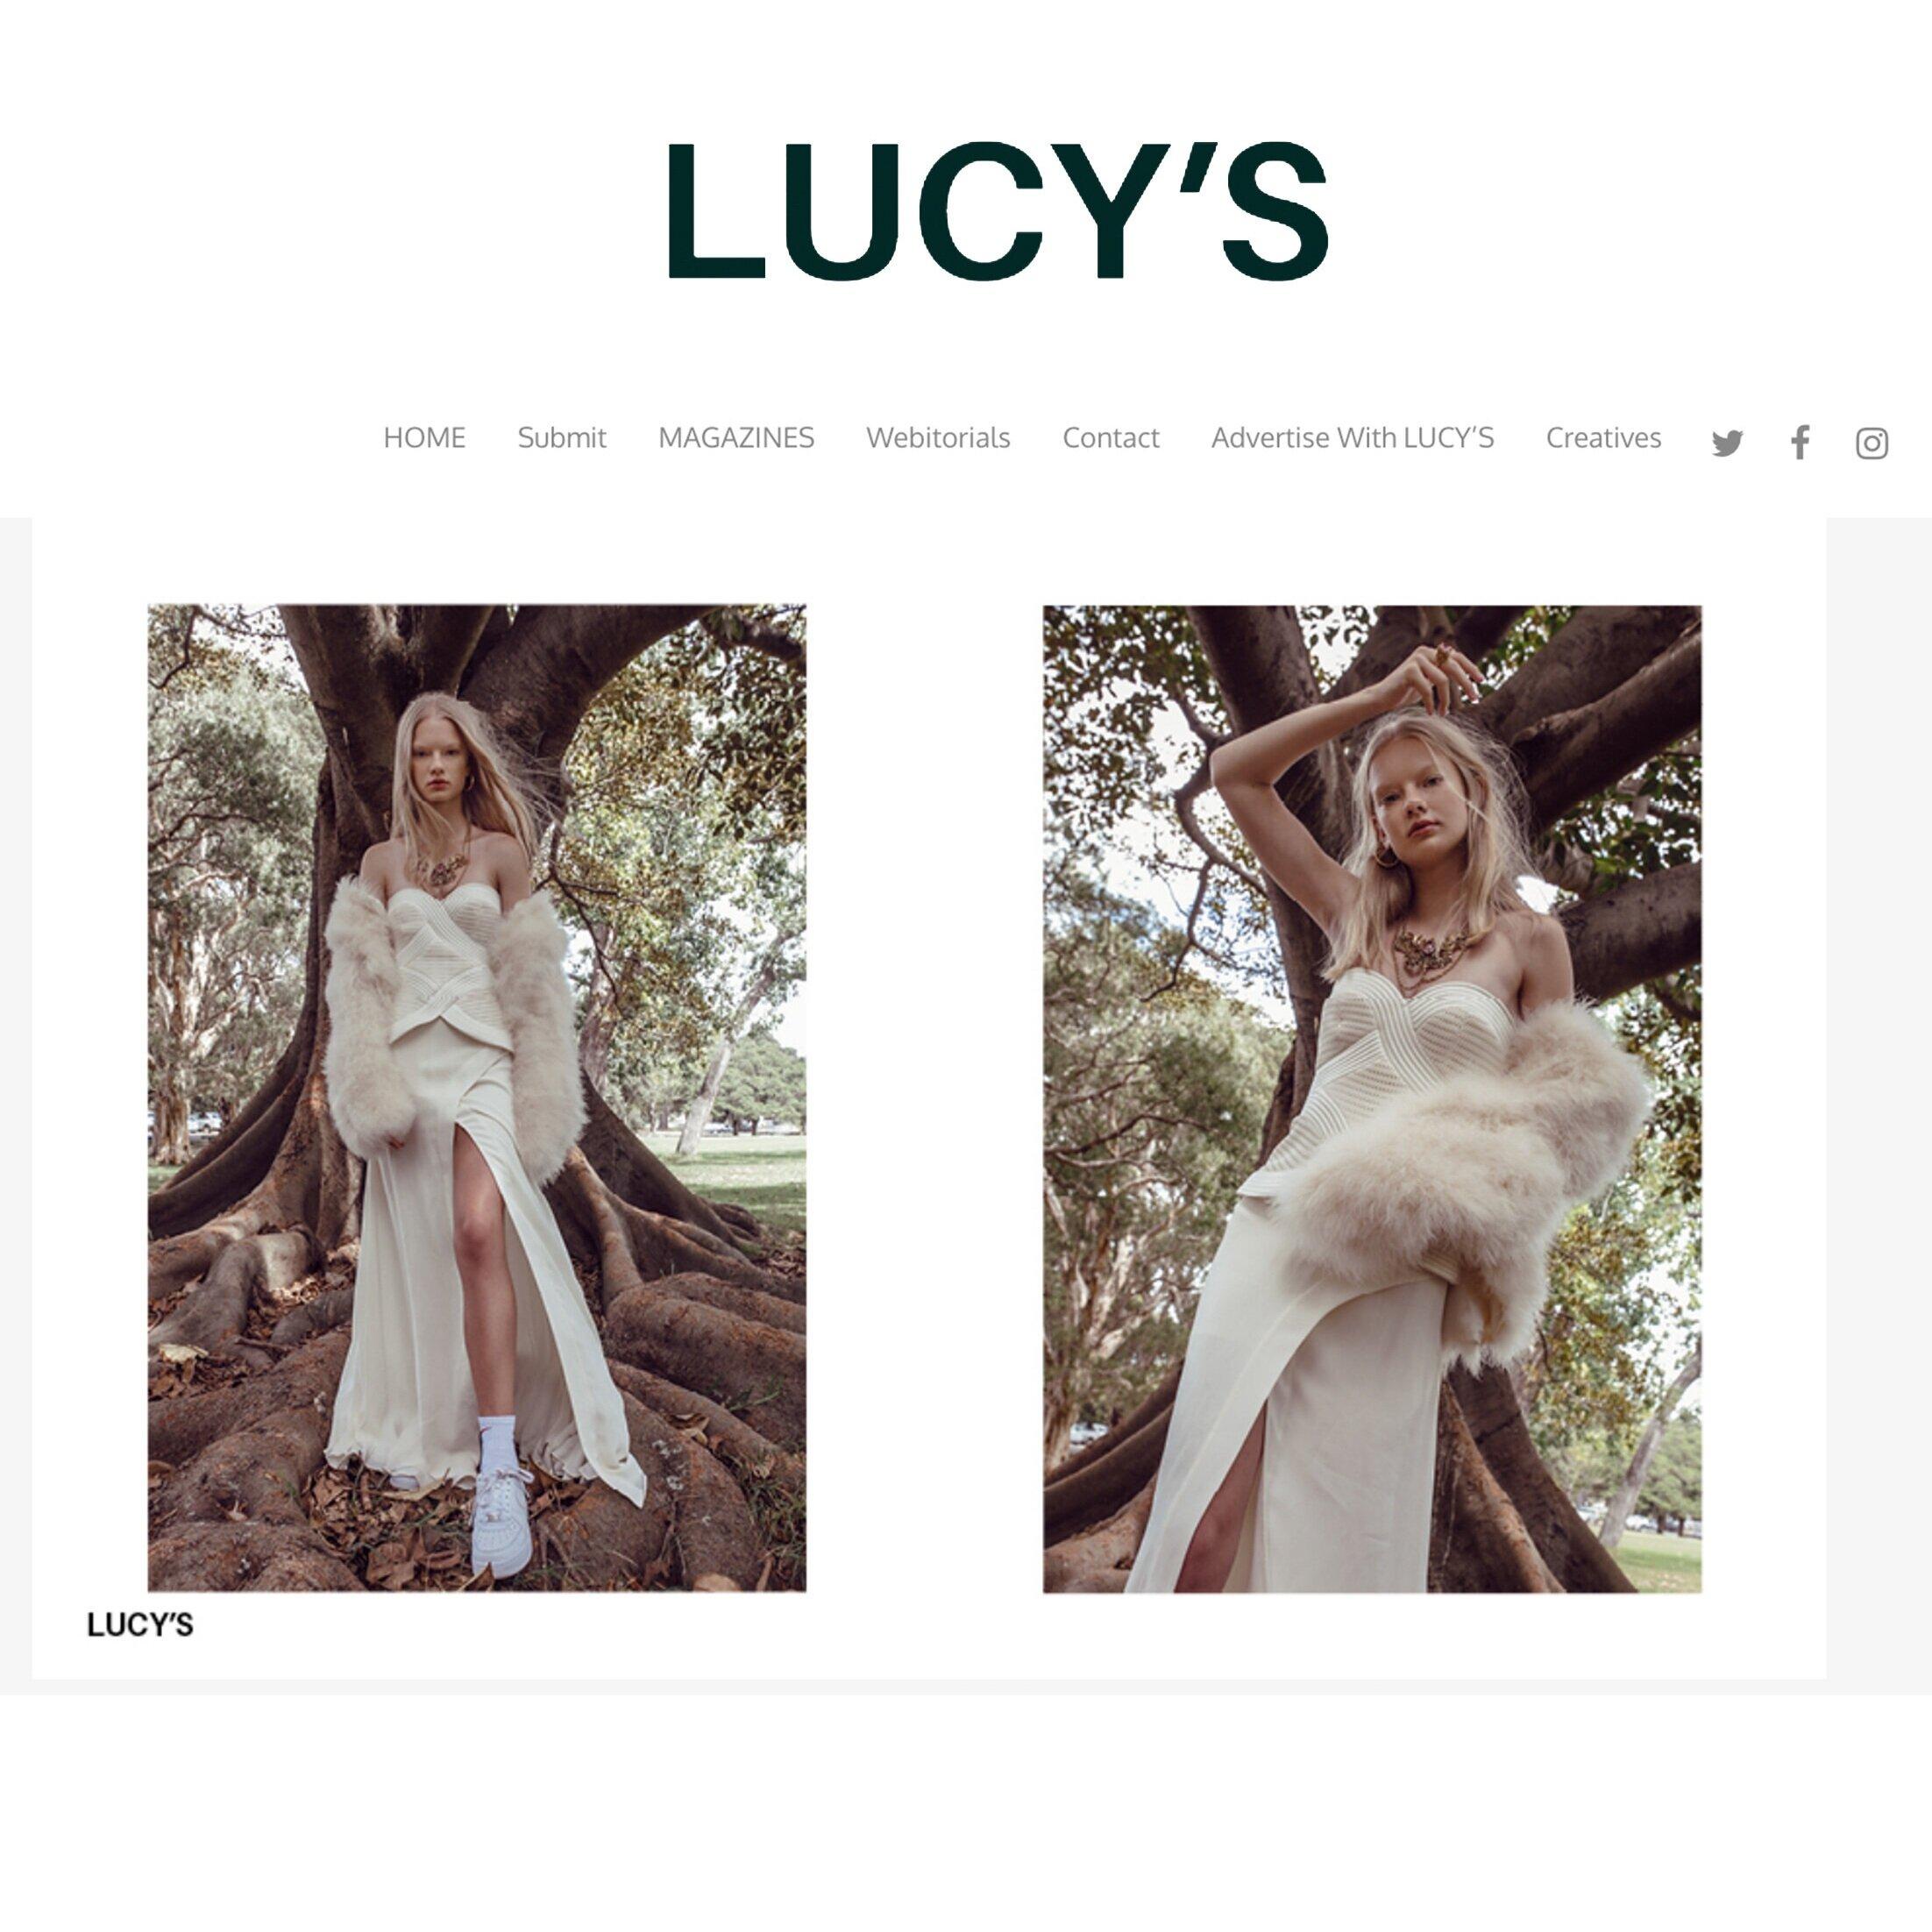 lucys.jpg